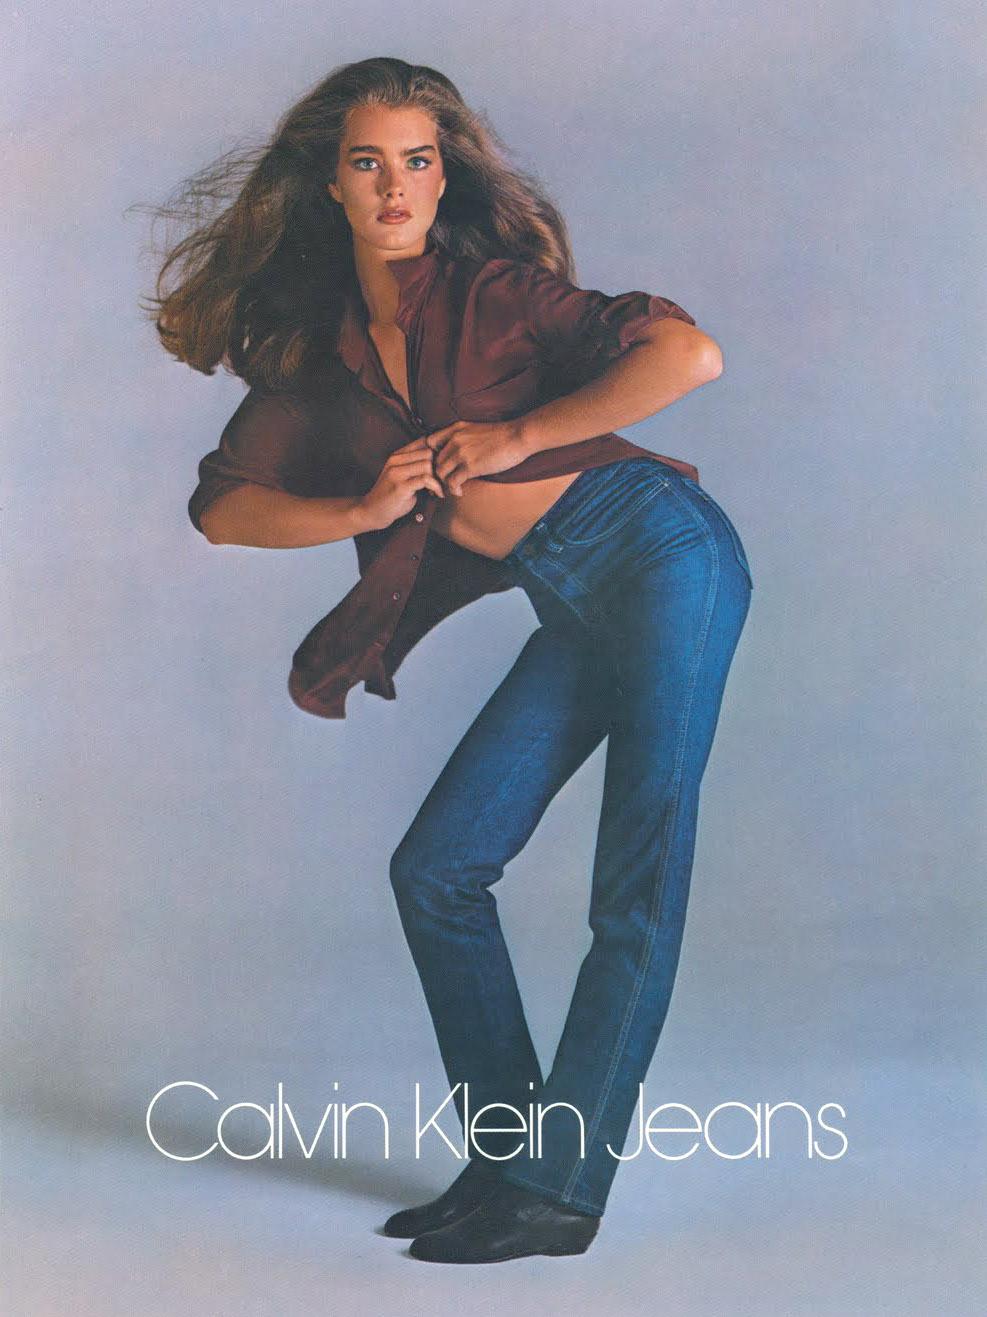 jeanscy brookie shields calvin klein